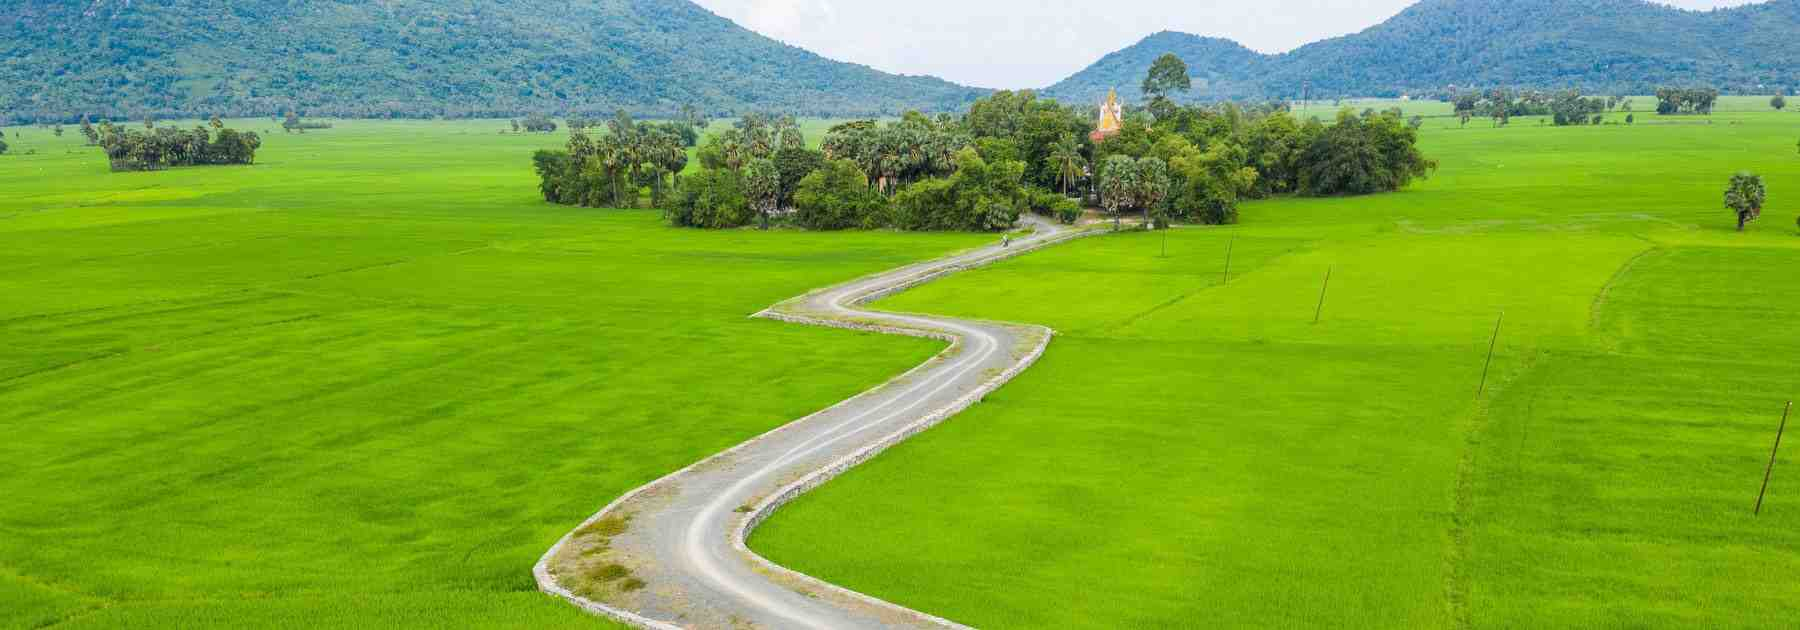 Chau doc biking road